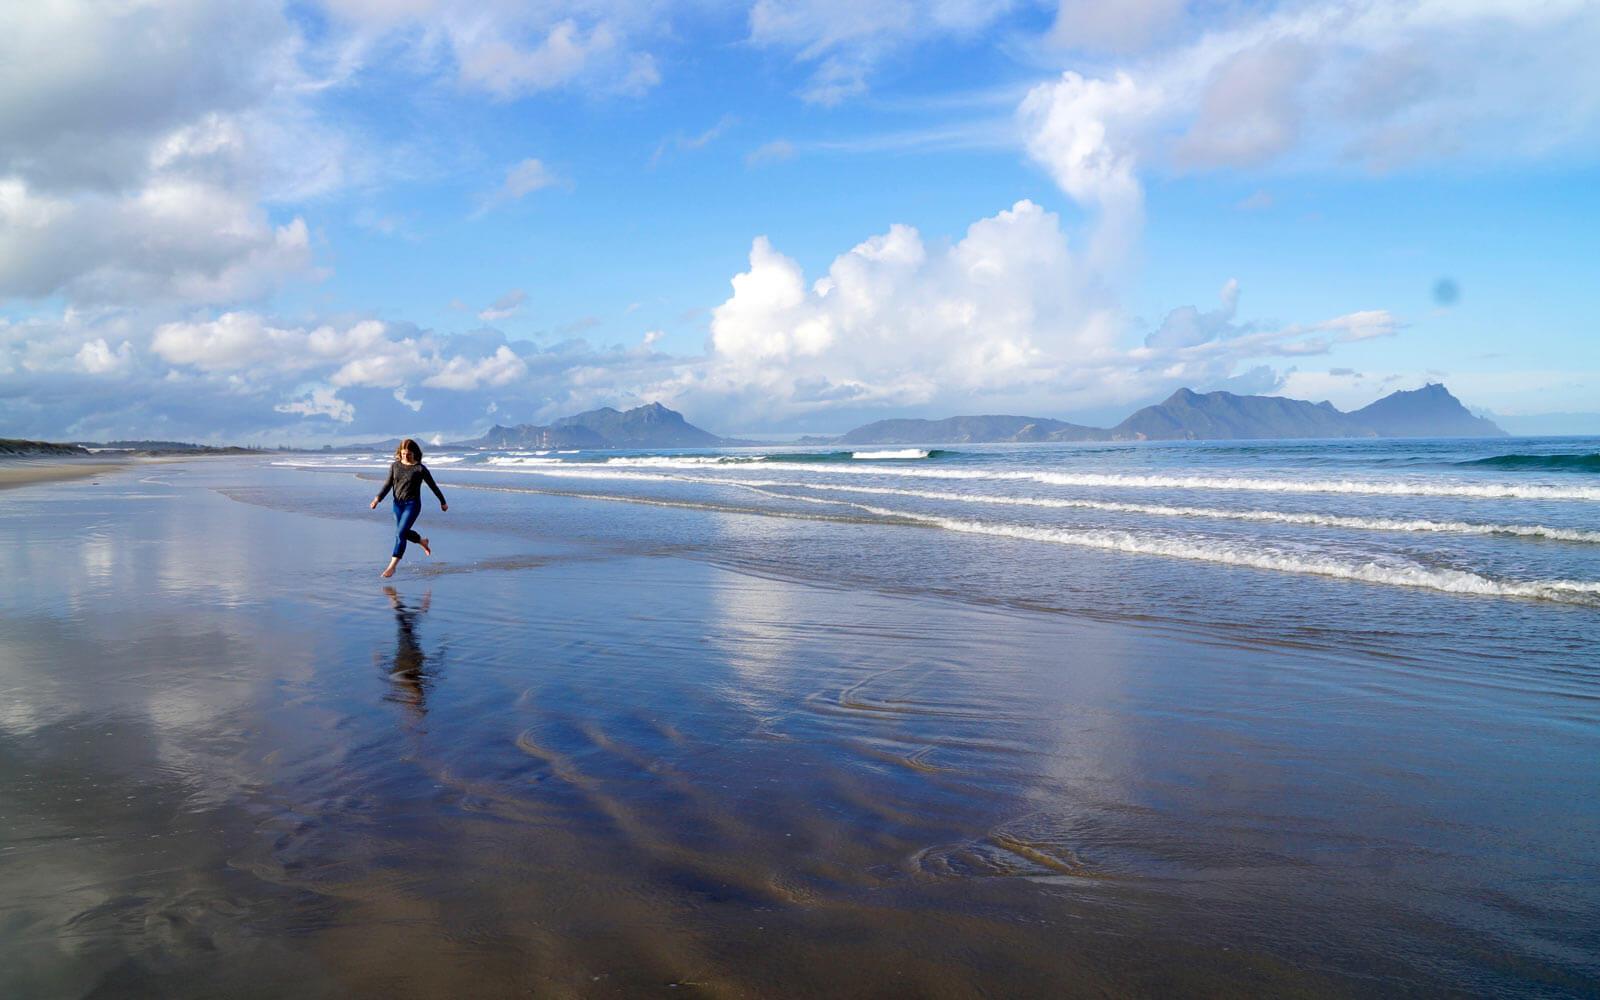 Lena am Bream Bay in Neuseeland